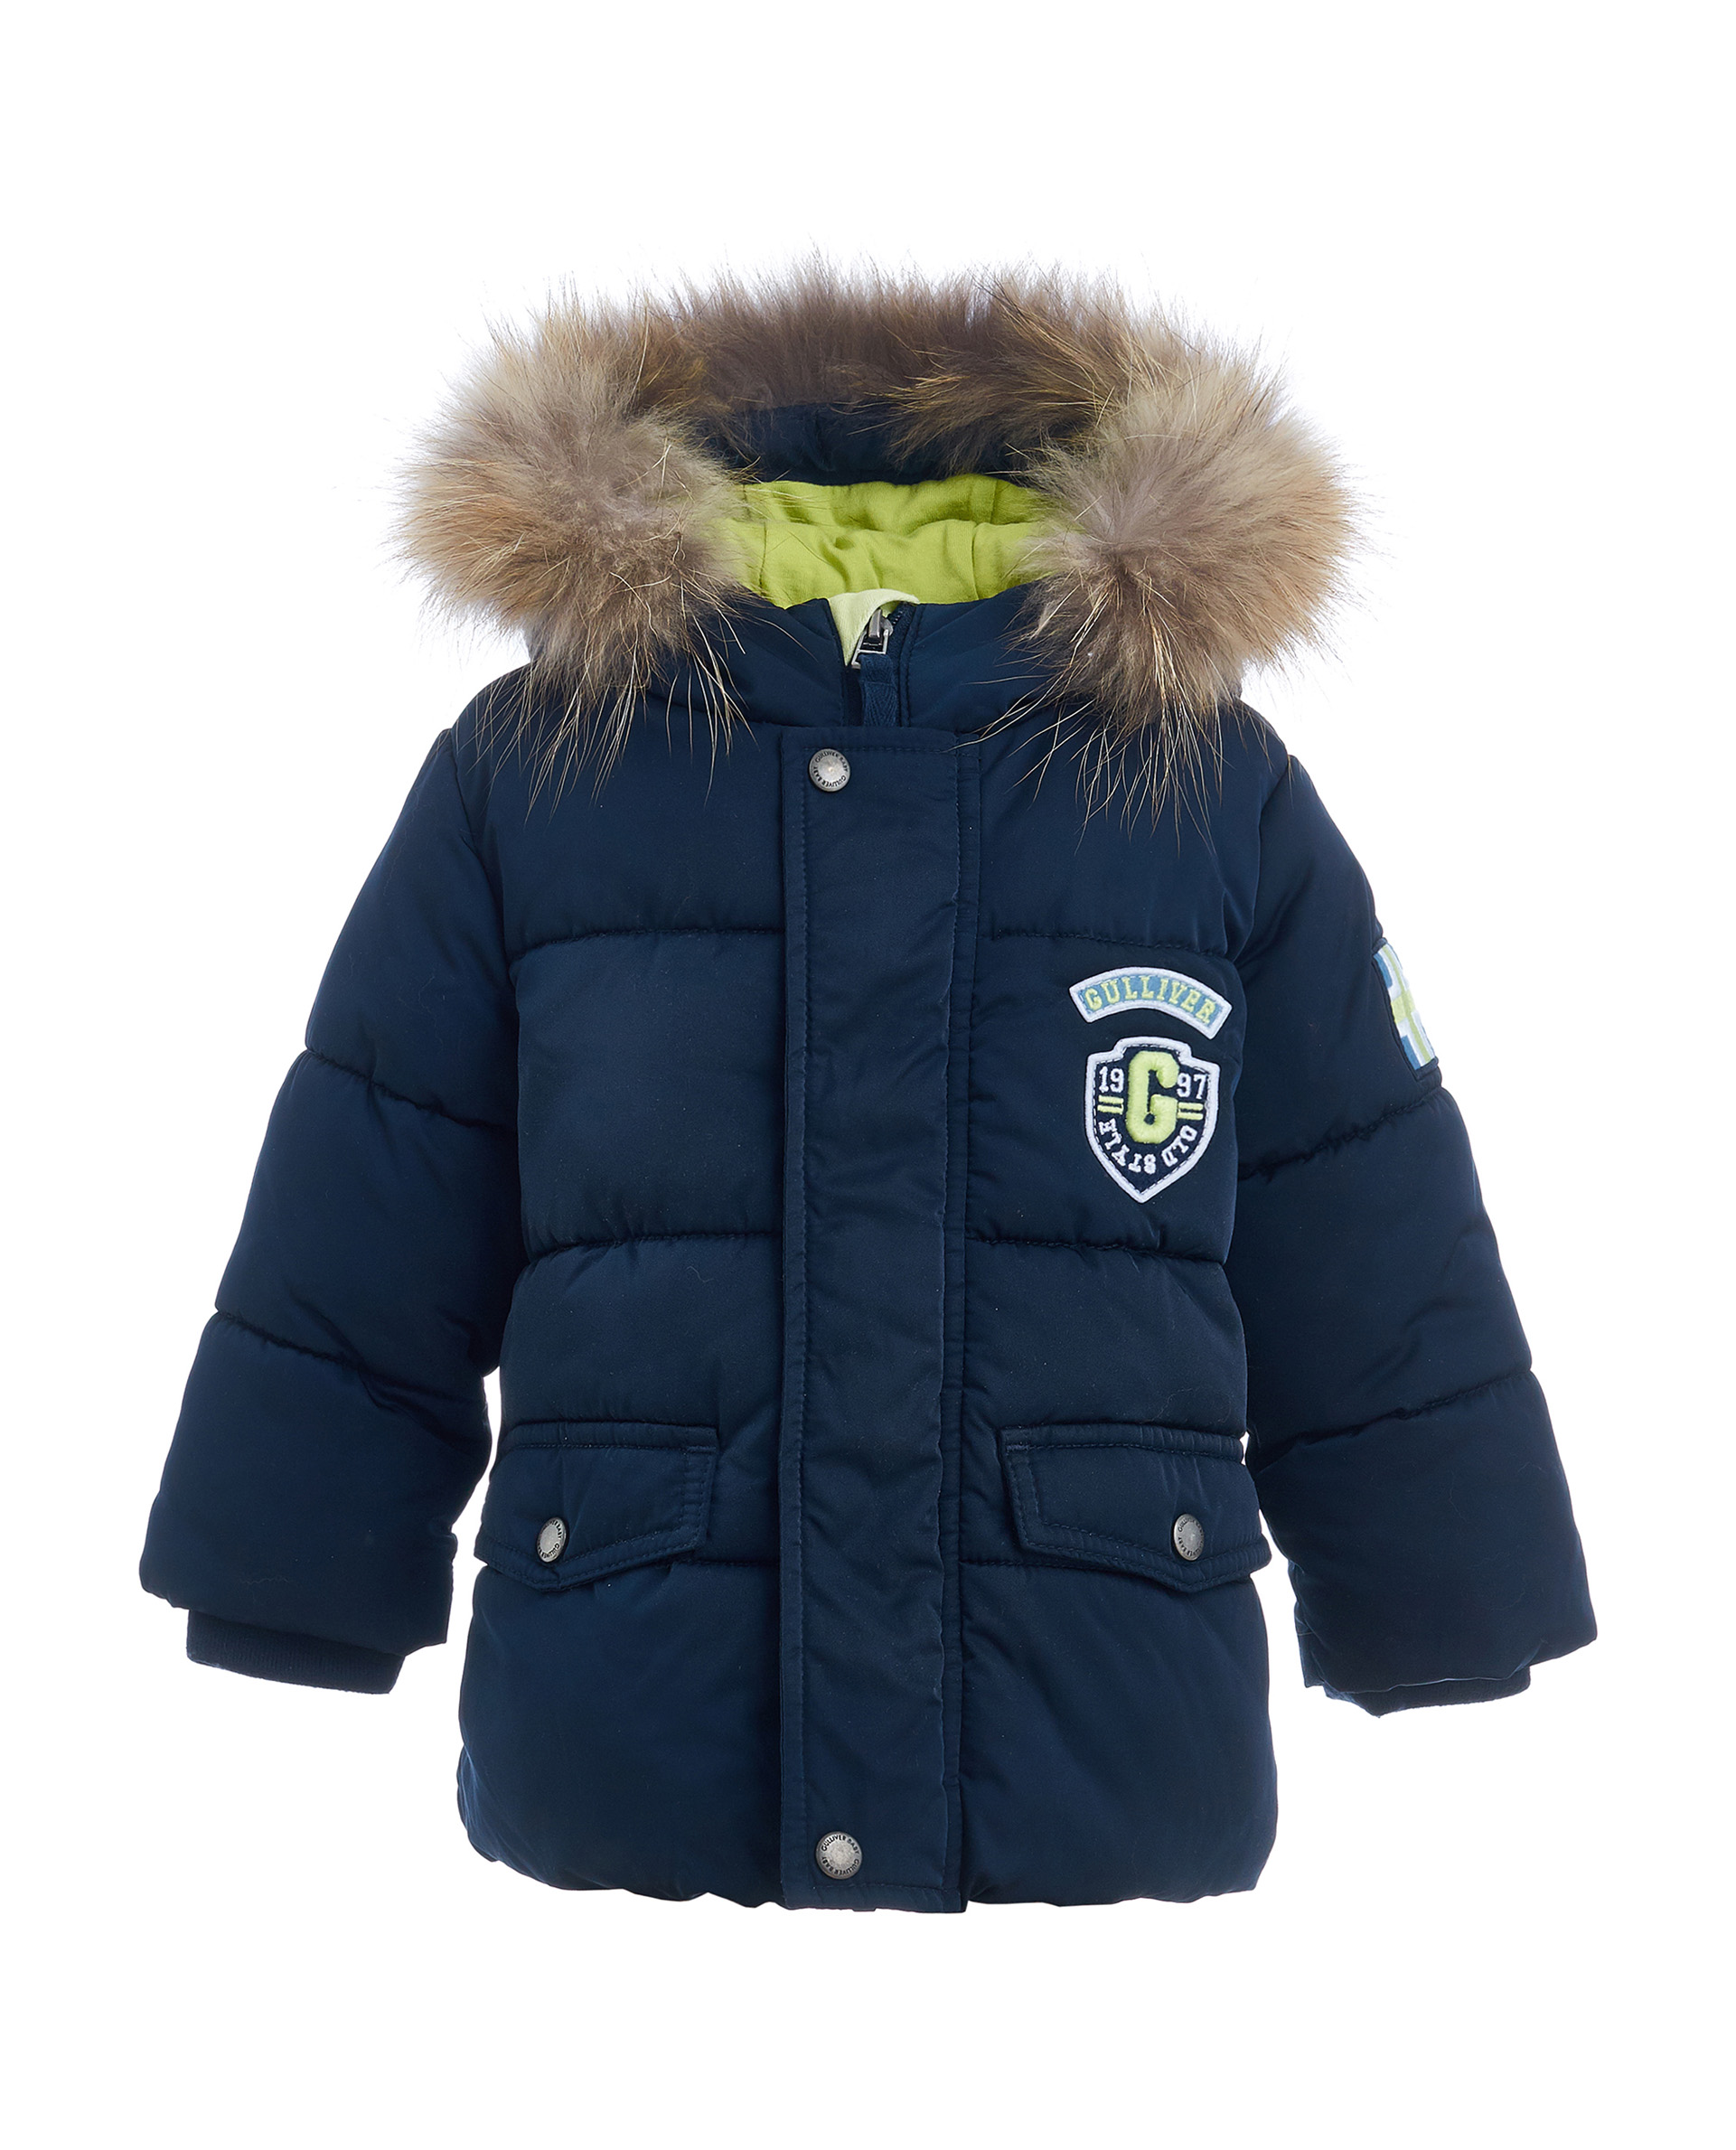 Куртка для мальчиков Gulliver, цв. синий, р.92 21933BBC4102